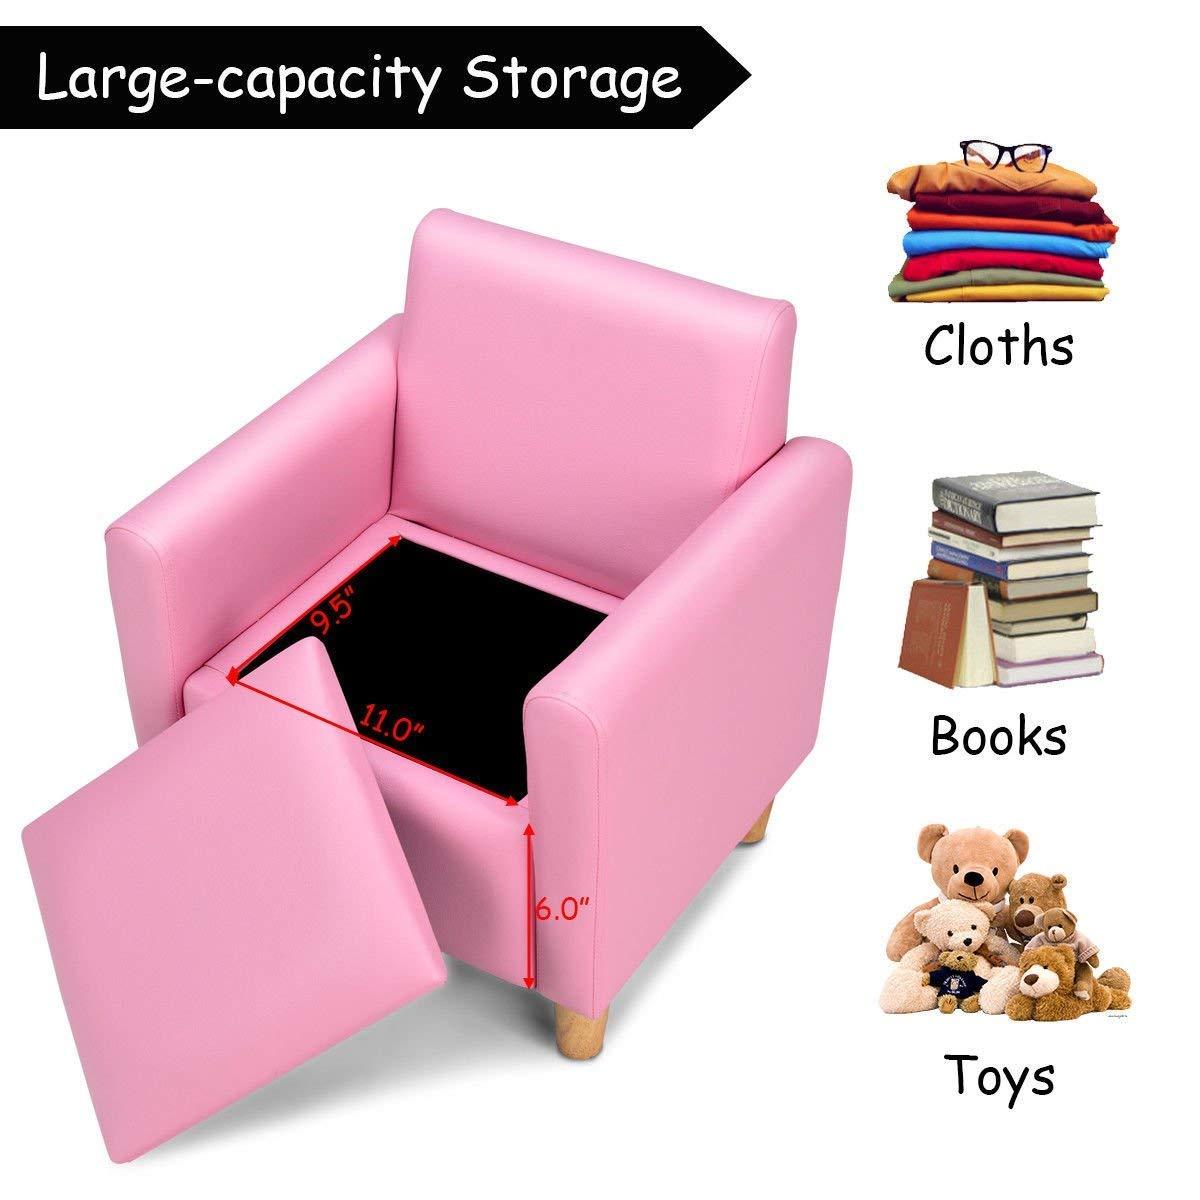 HONEY JOY Kids Sofa, Upholstered Armrest, Sturdy Wood Construction, Toddler Couch with Storage Box (Single Seat, Pink) by HONEY JOY (Image #4)